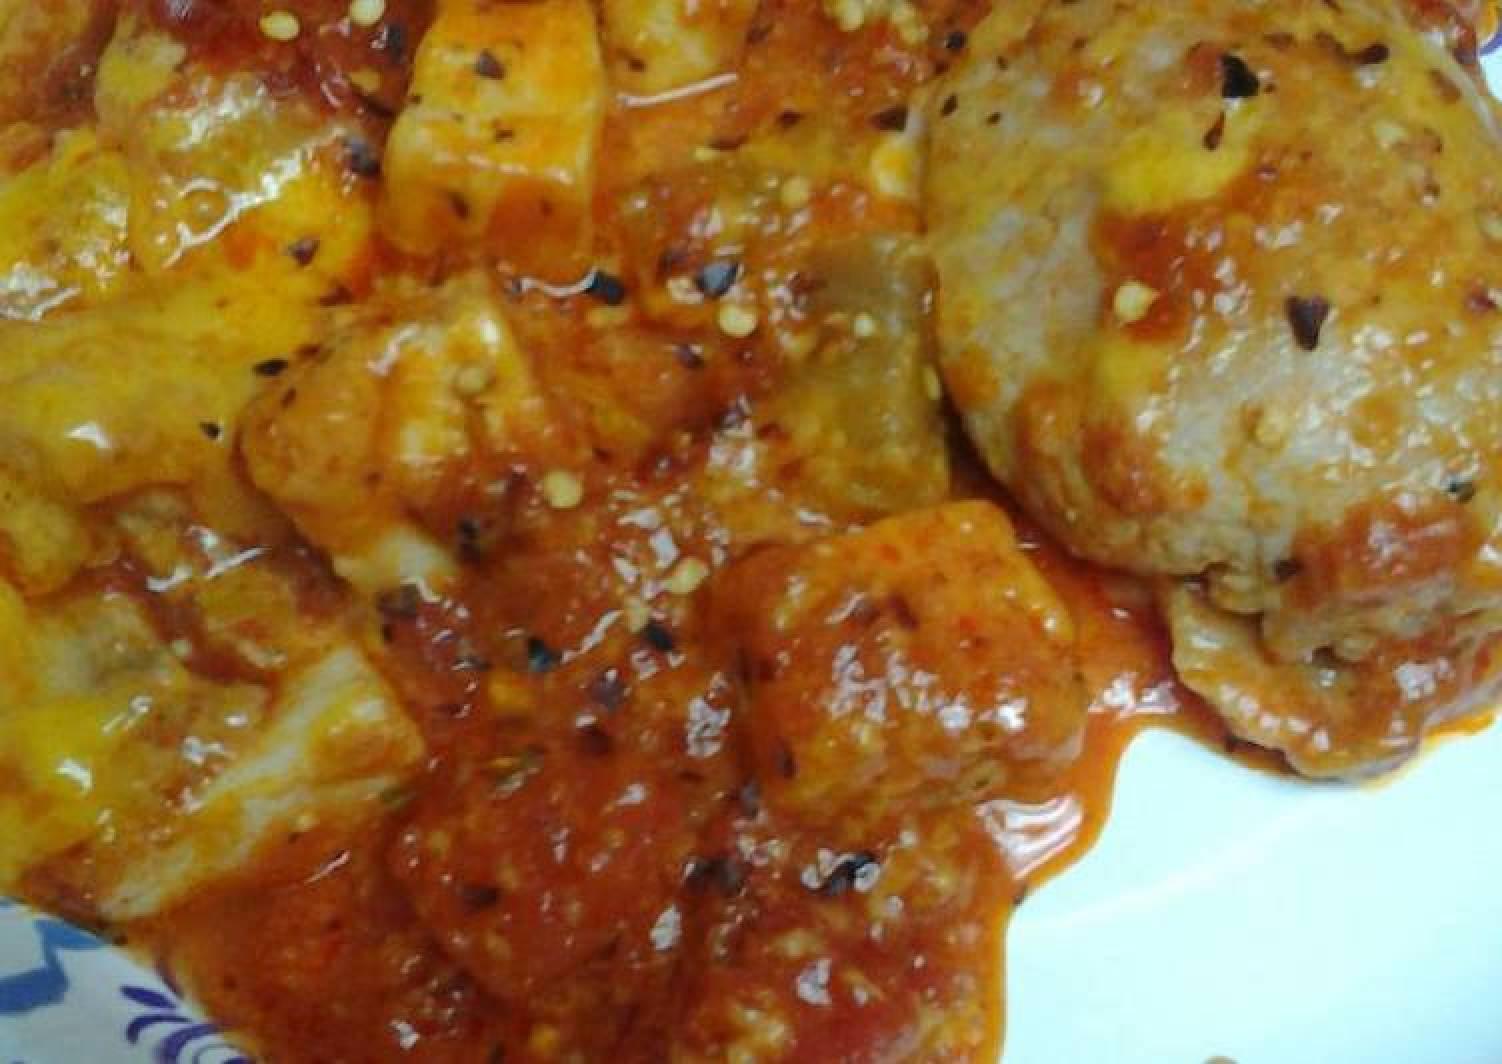 Eggplant casserole stove top